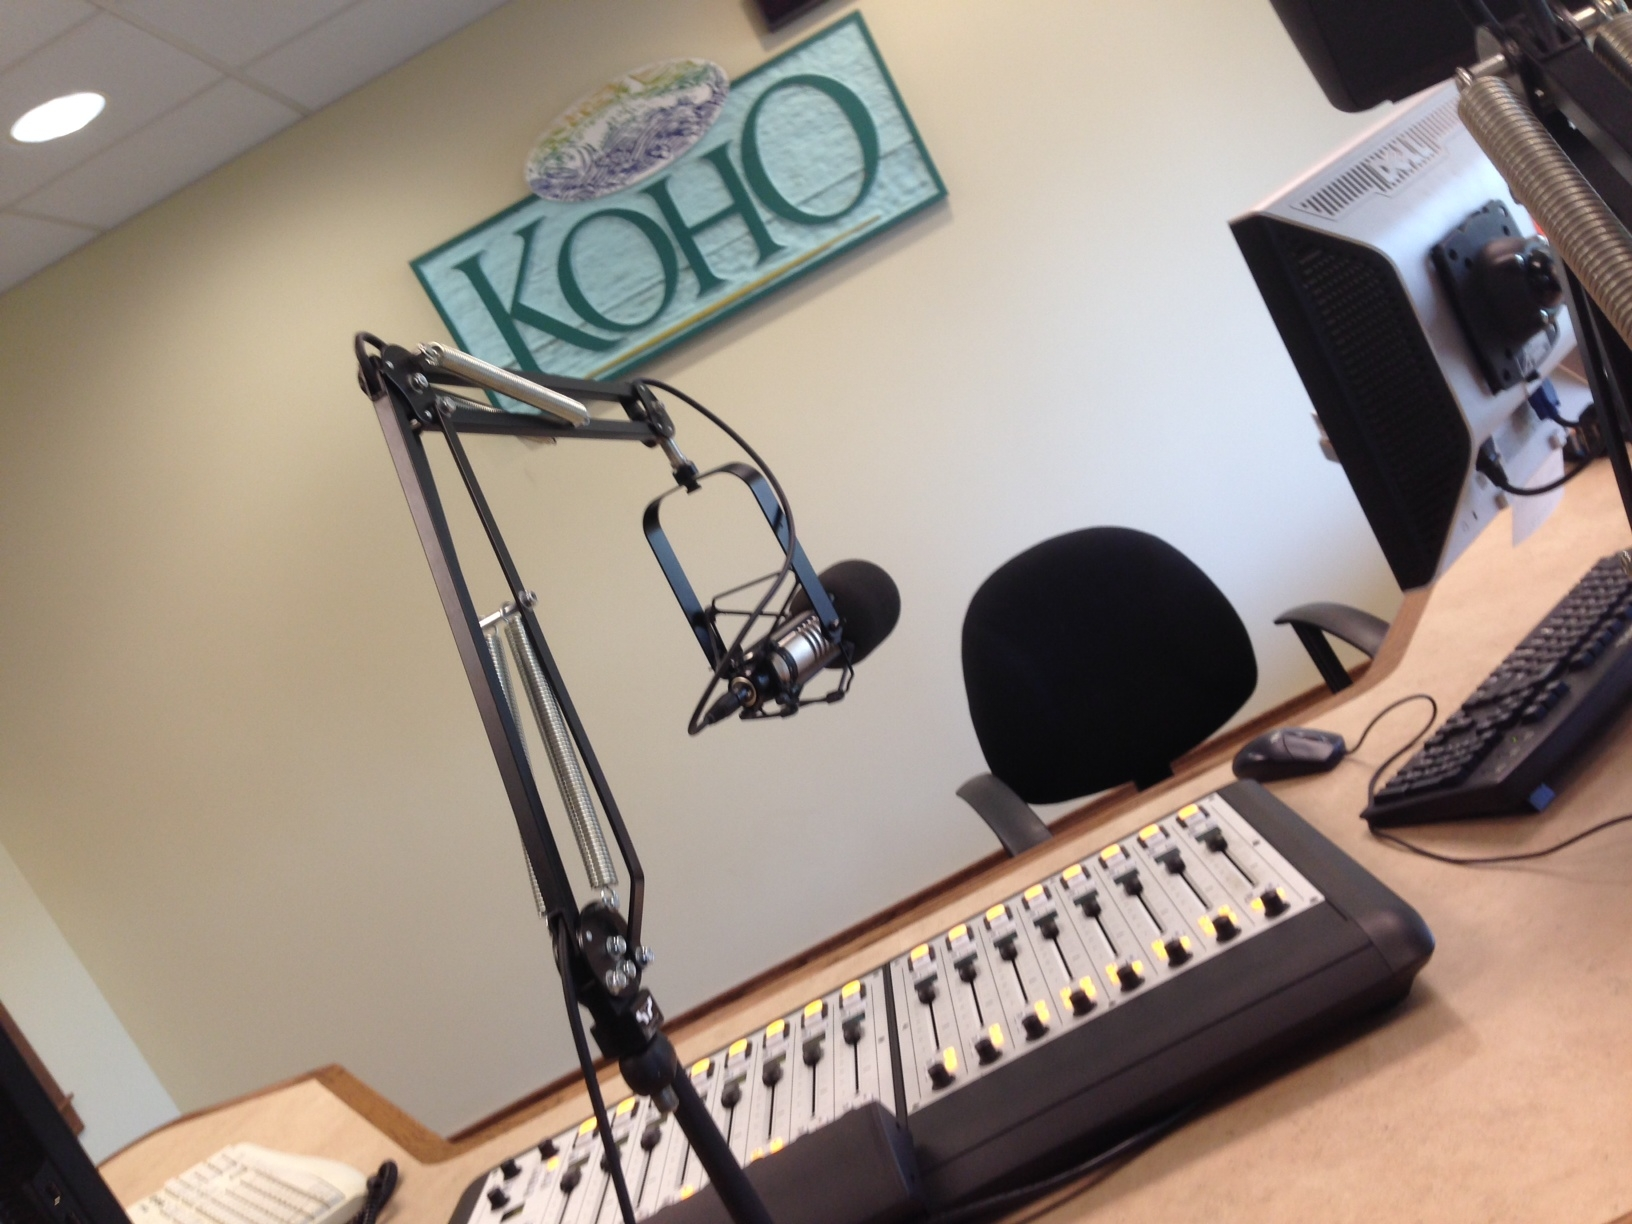 The KOHO 101.1 studios in downtown Wenatchee